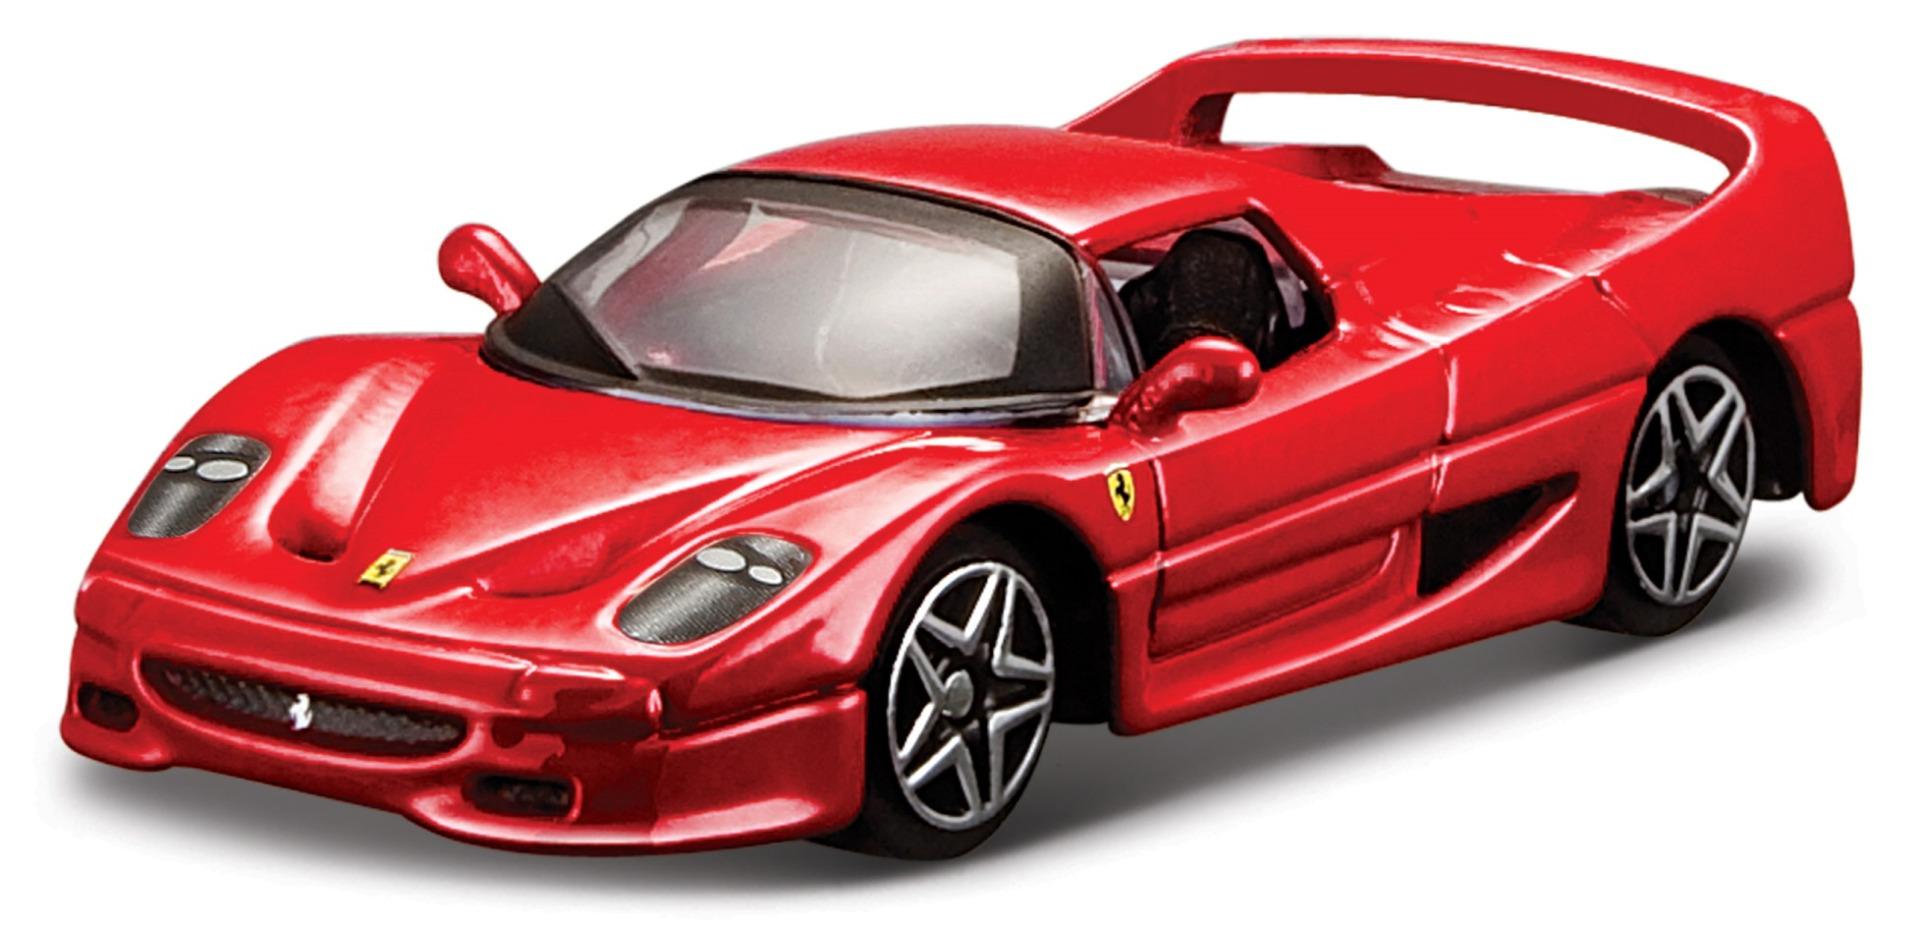 Ferrari F50 Race & Play Scale 1:64 (Red/Vermelho)